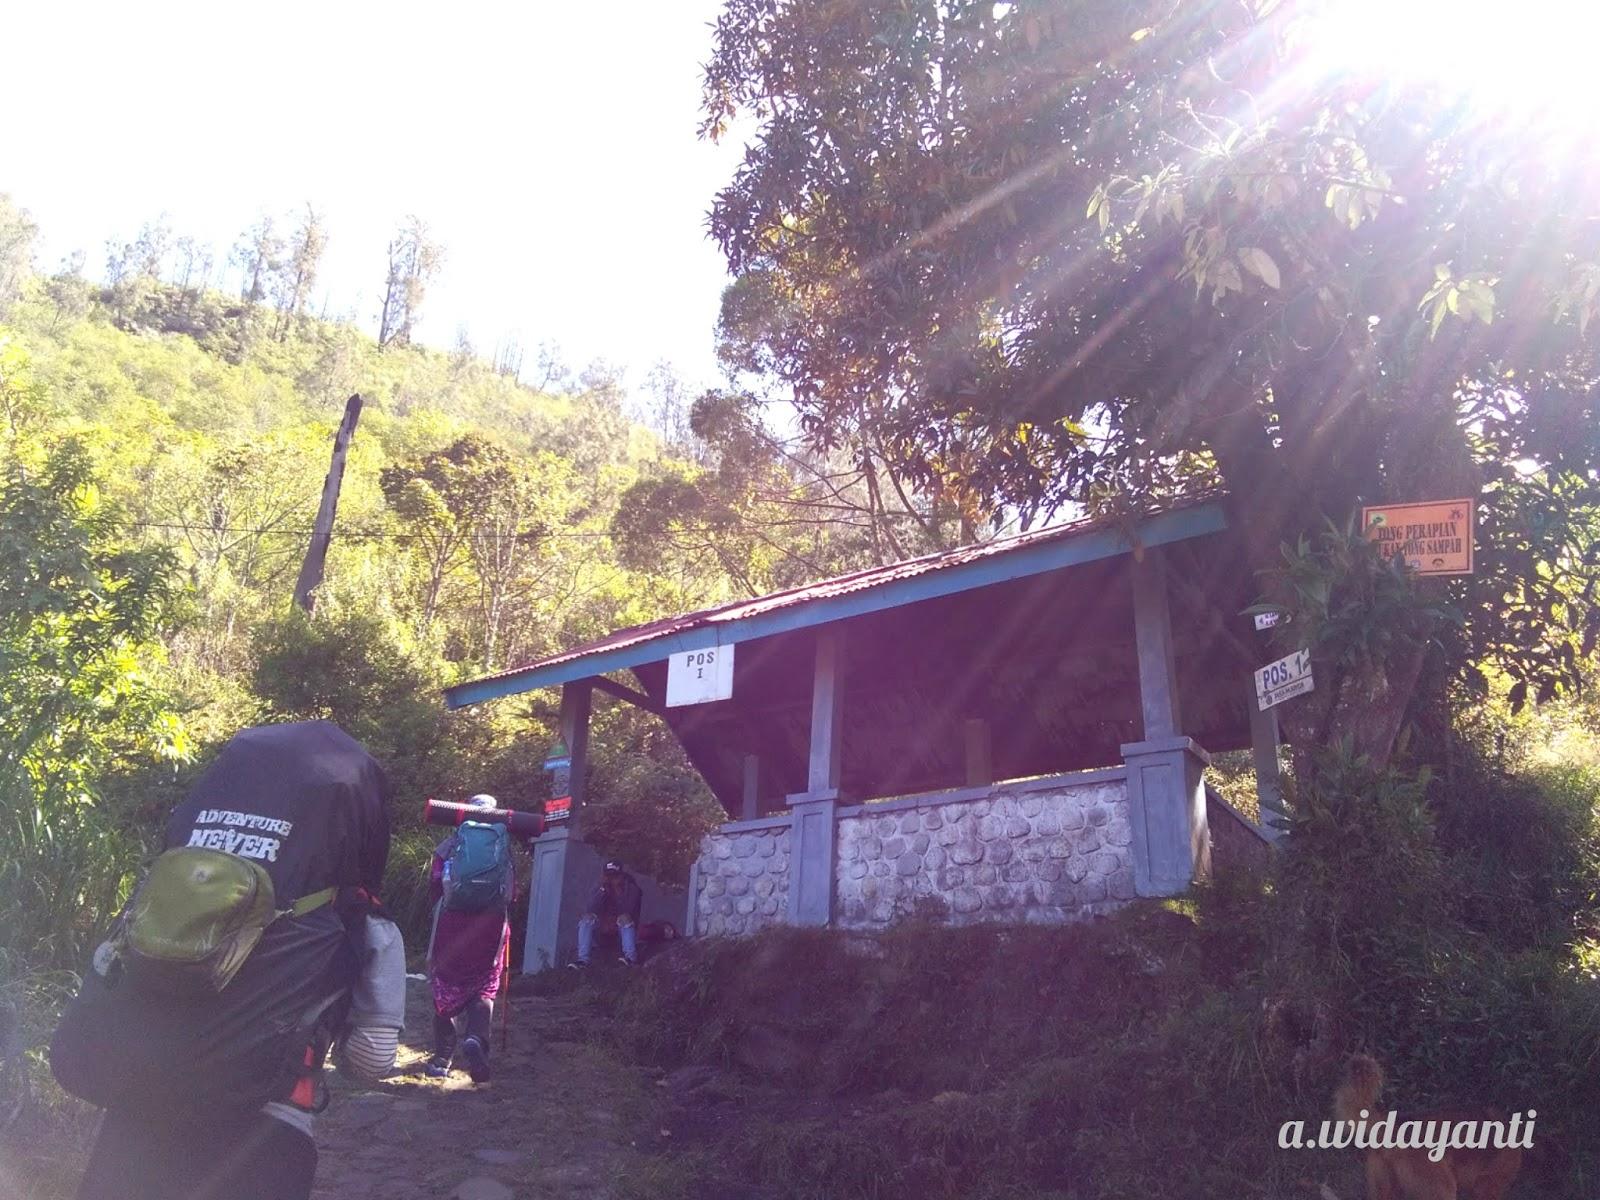 View Pendakian Gunung Lawu Via Cemoro Sewu 2019 Pictures